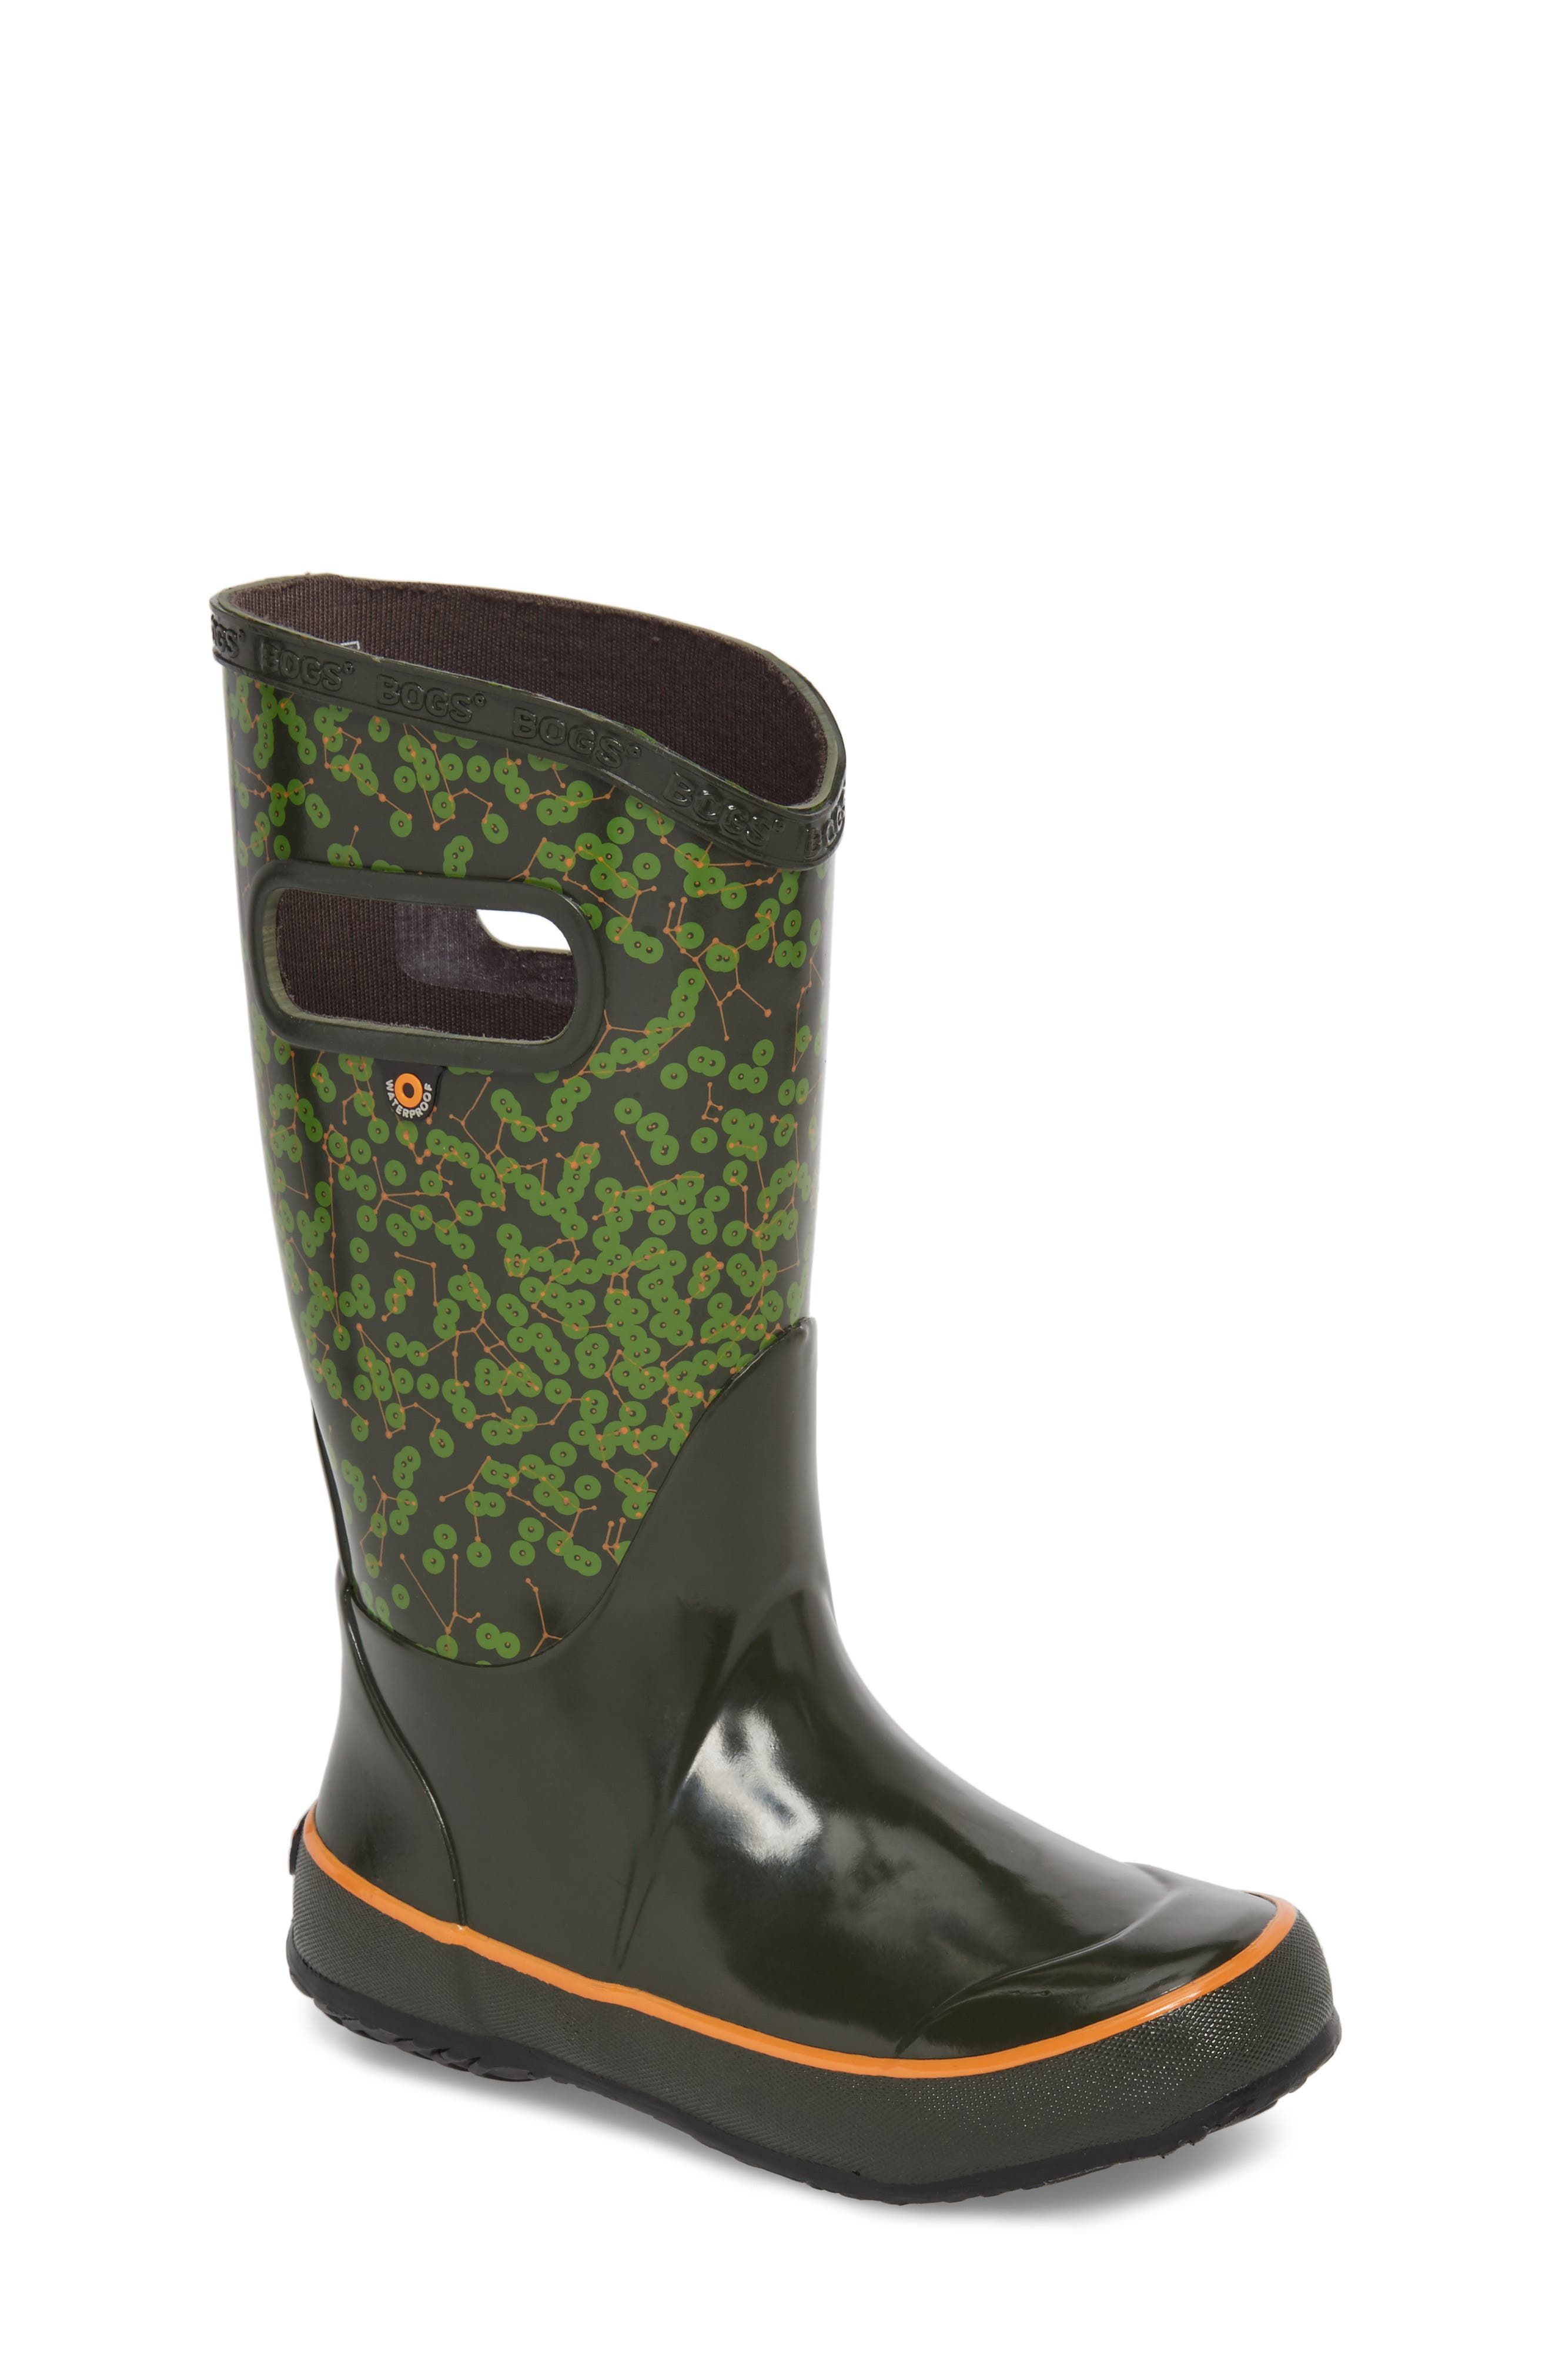 Bogs Constellations Waterproof Rubber Rain Boot (Walker, Toddler & Little Kid)